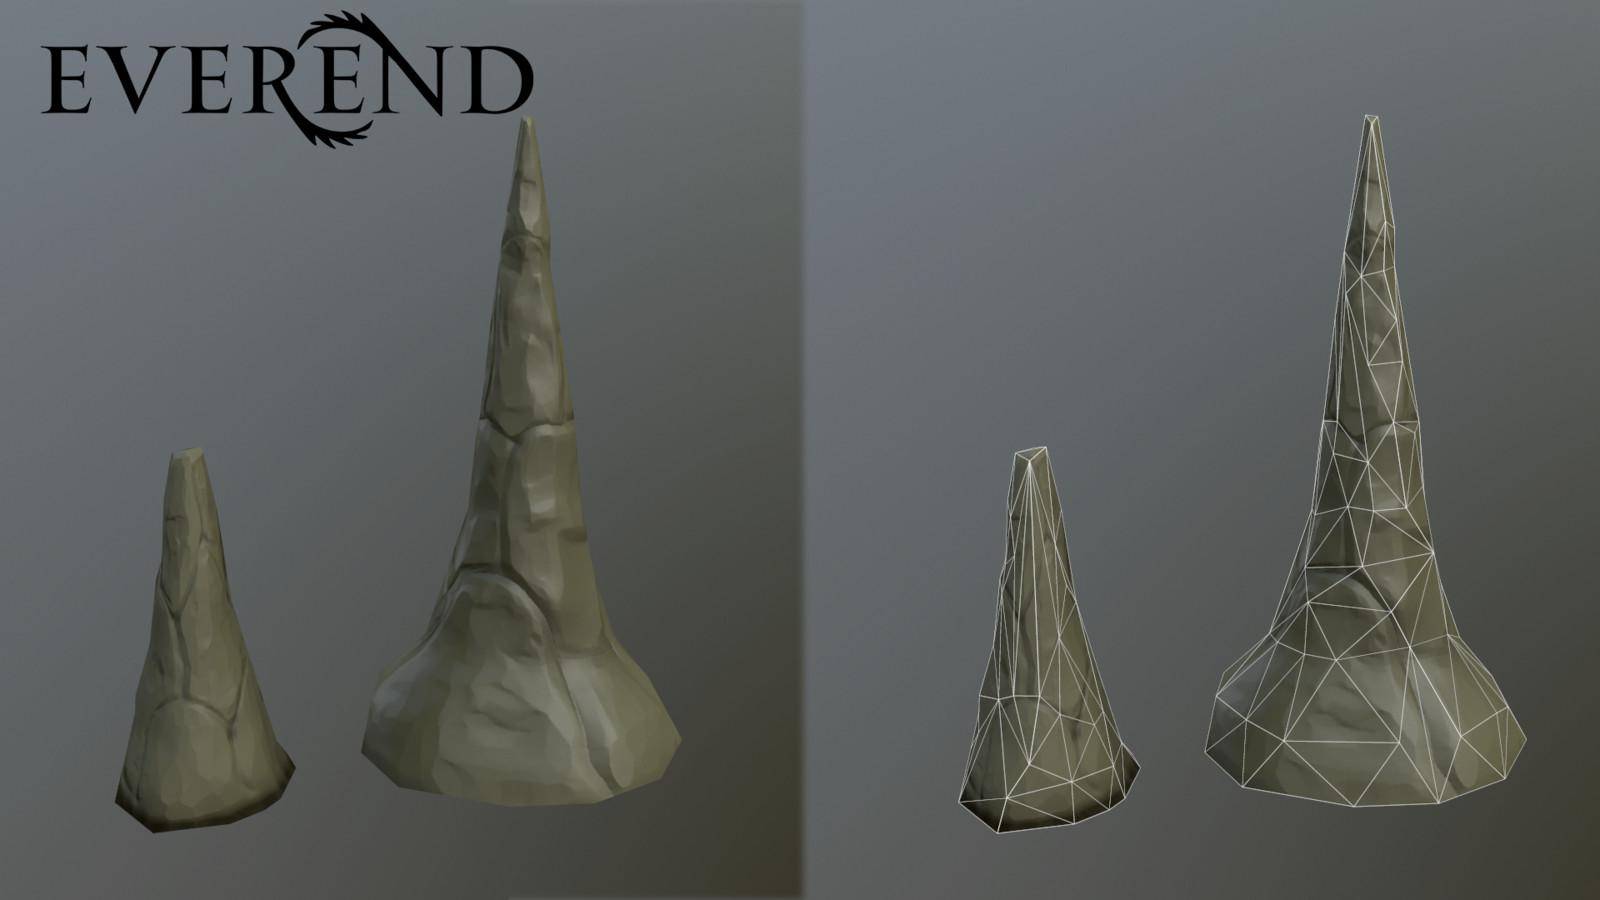 stalagmites (or stalactites)